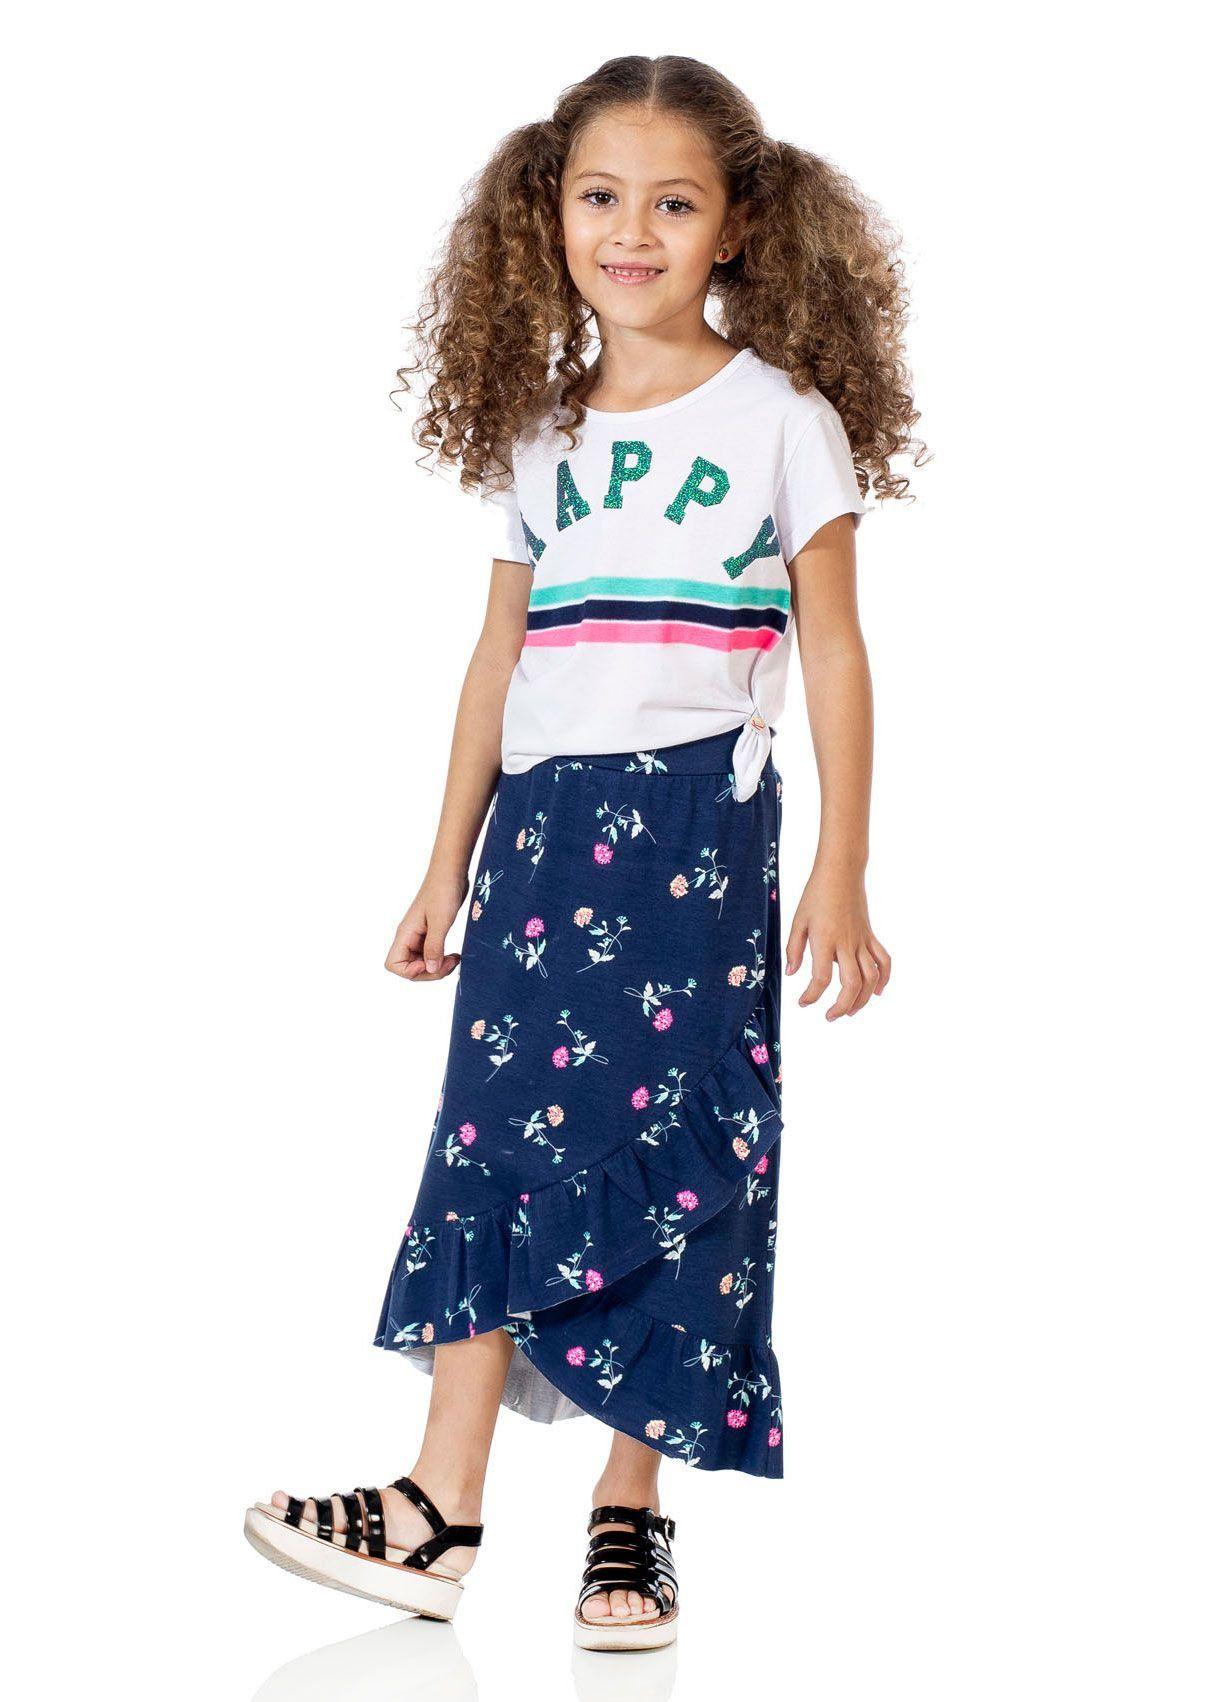 Conjunto Infantil Feminino Verão Branco Happy Kids Club